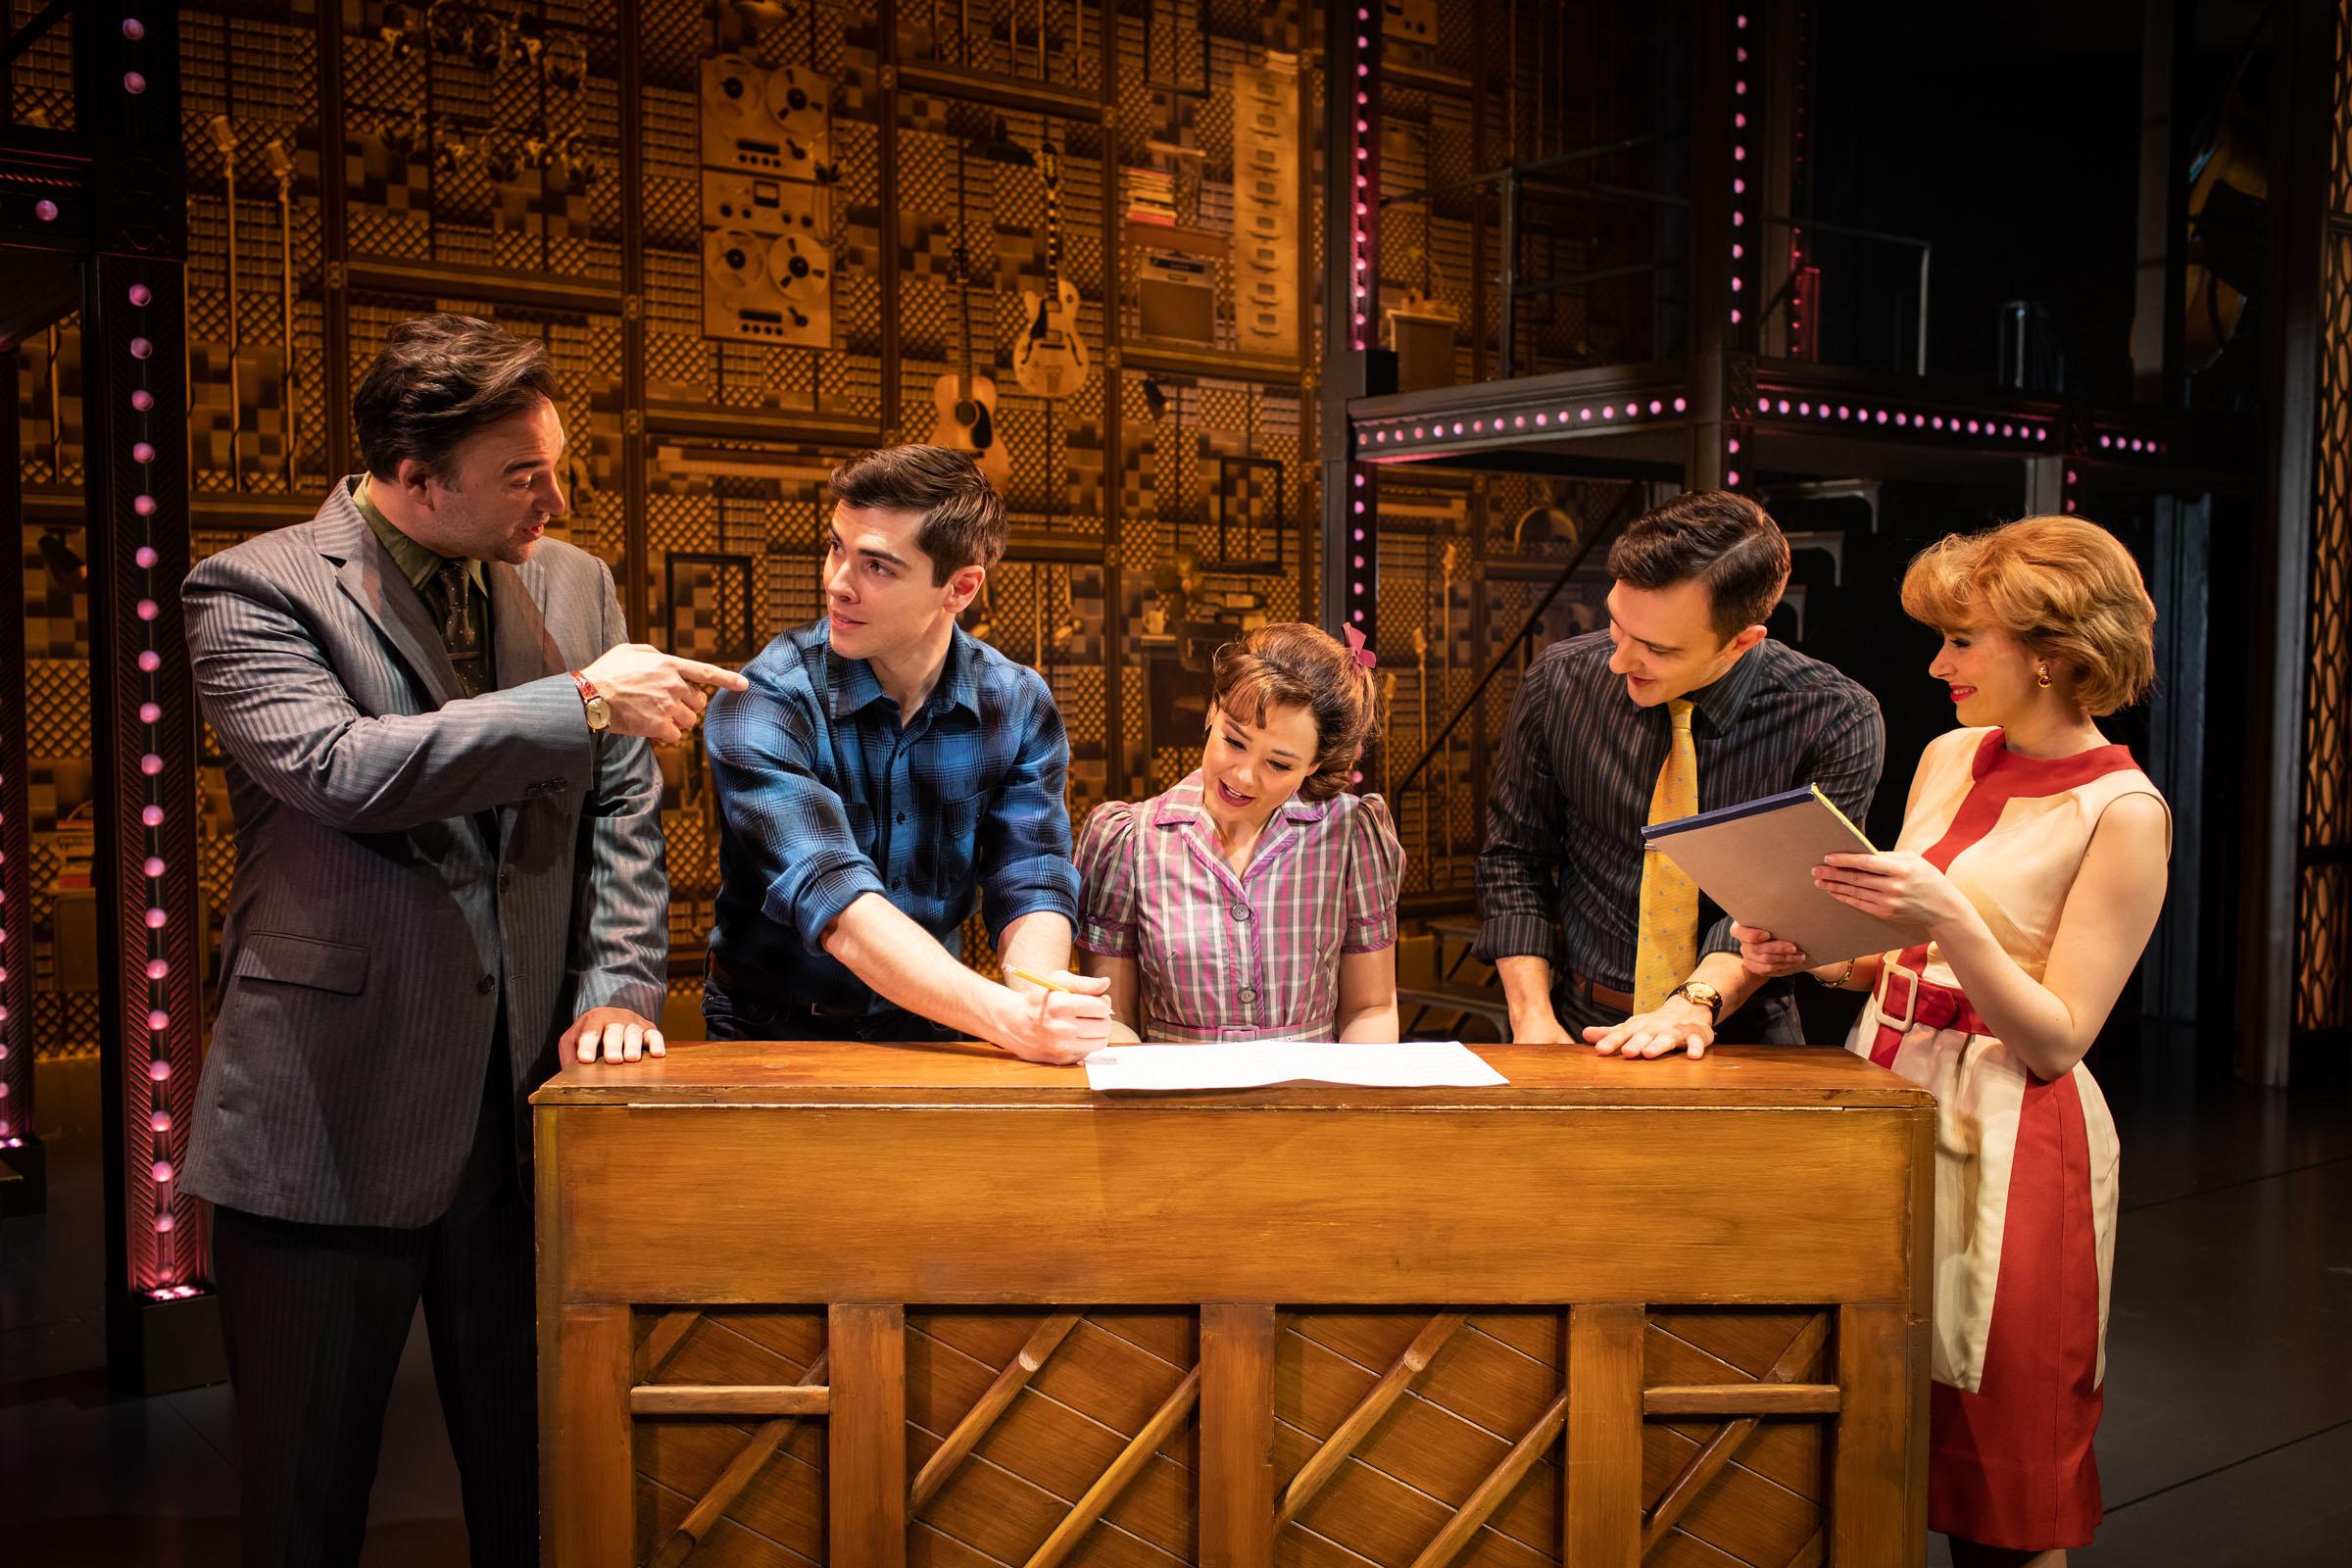 Oliver Boot as Donnie Kirshner; Adam Gillian as Gerry Goffin; Daisy Wood-Davis as Carole King; Cameron Sharp as Barry Mann; Laura Baldwin as Cynthia Well